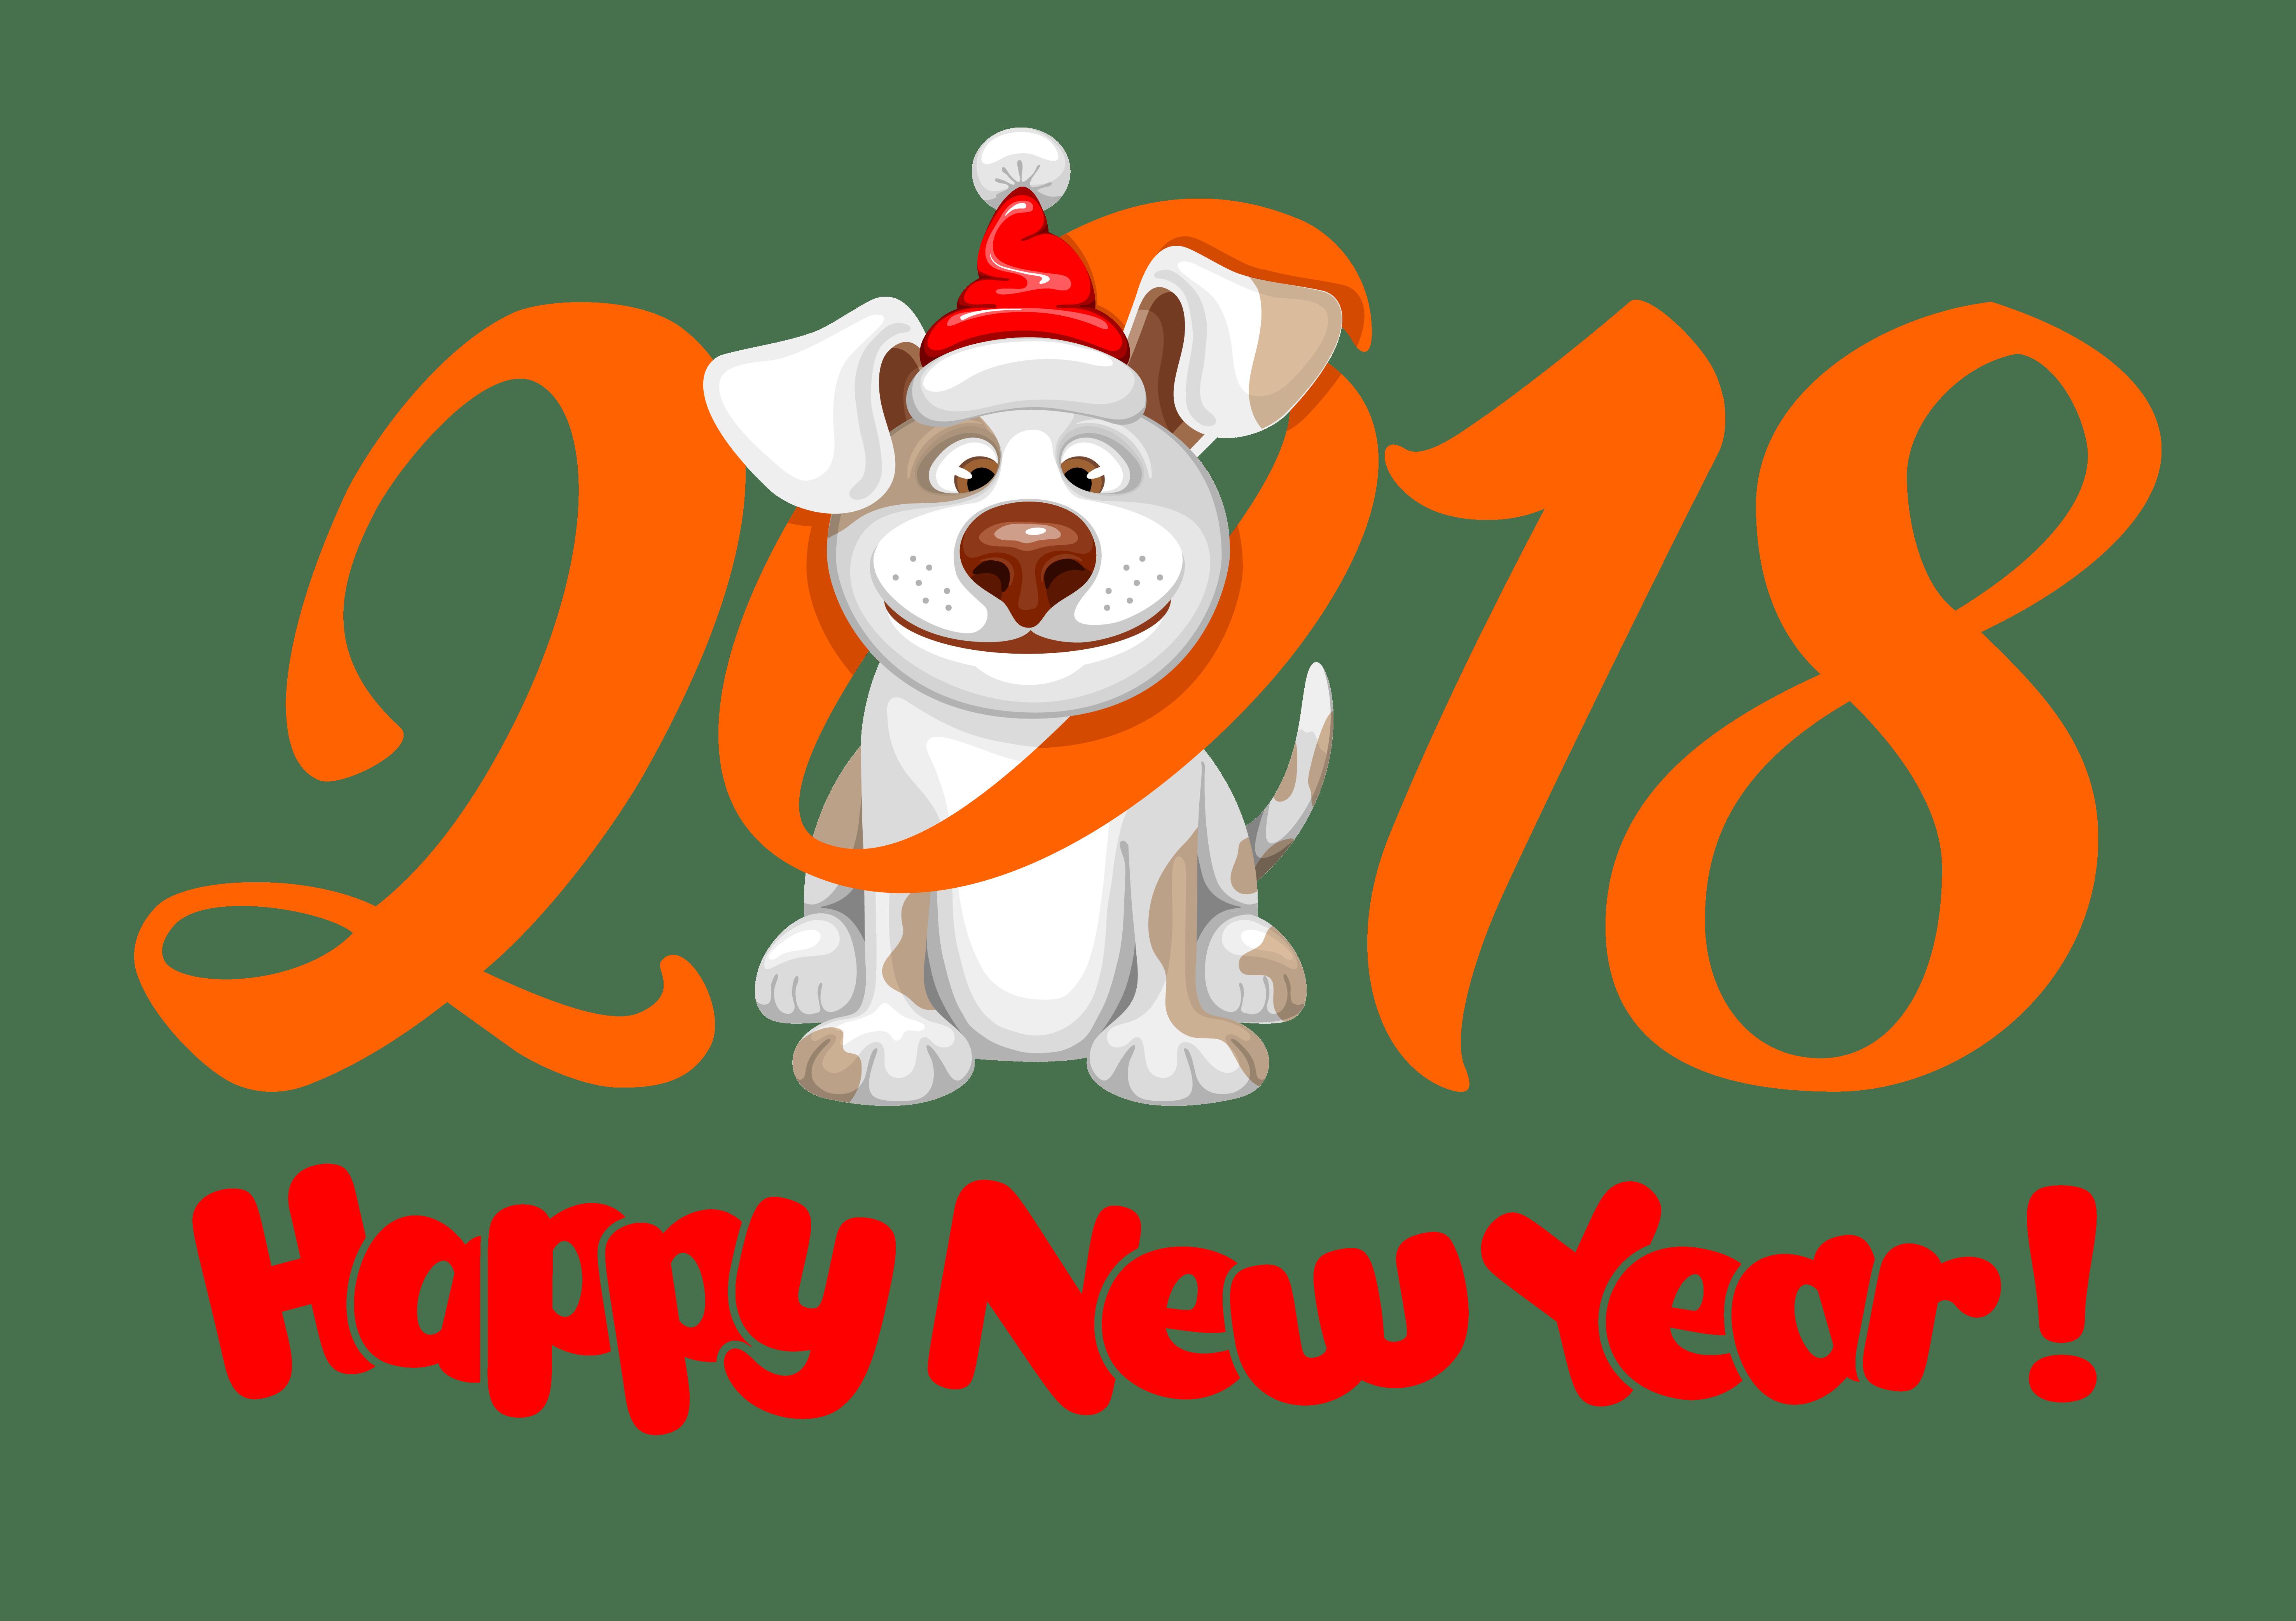 Dog 0 Chinese New Year Chinese zodiac.